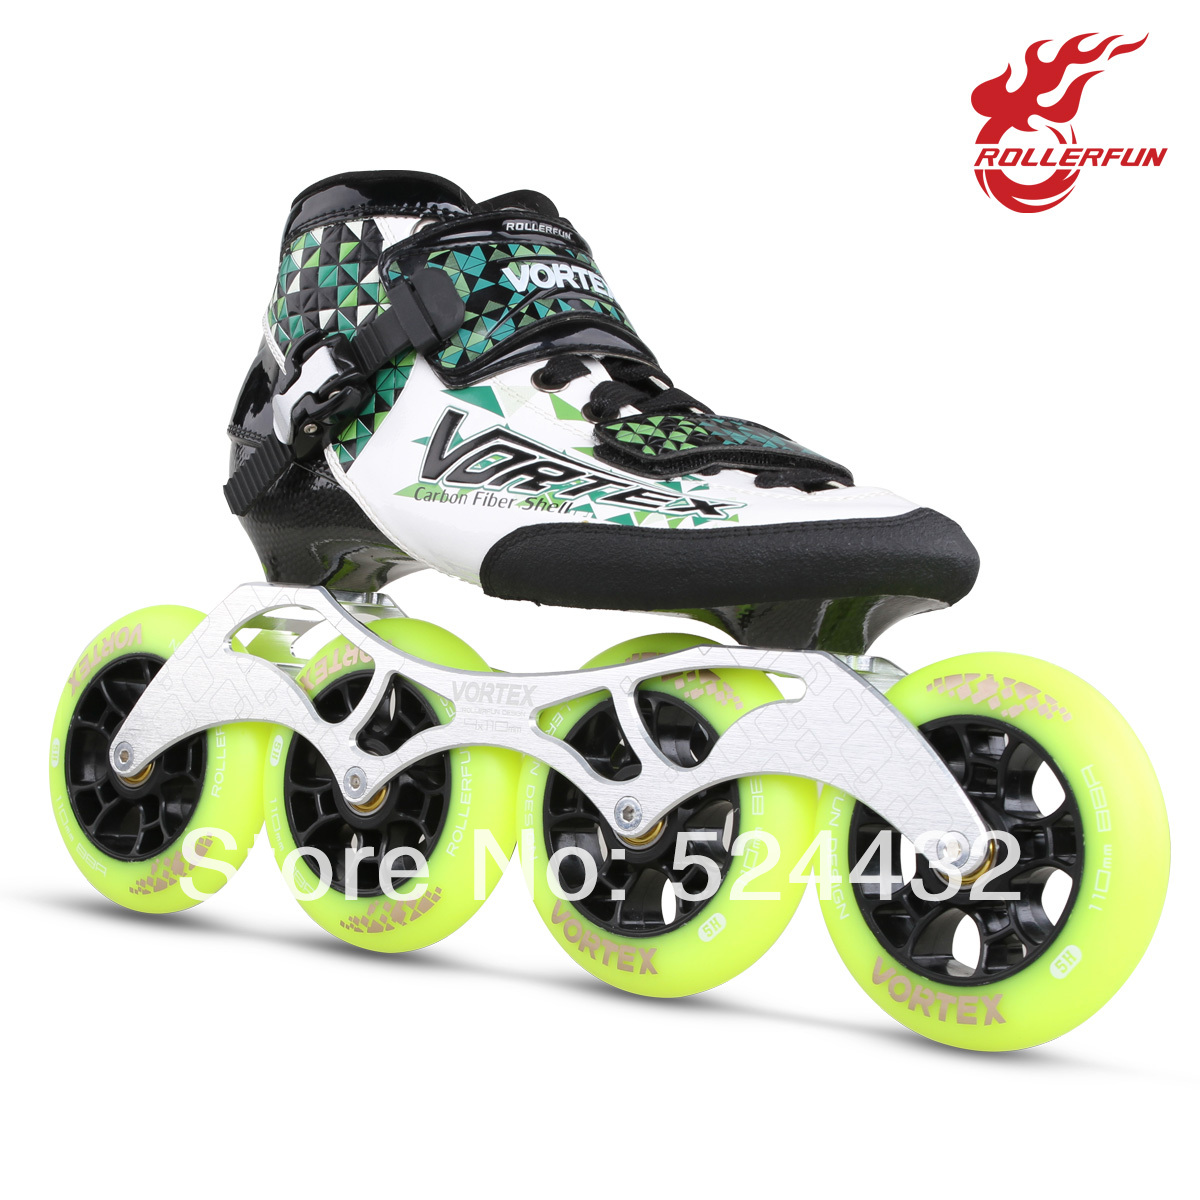 rollerfun rv702 child professional speed skating shoes